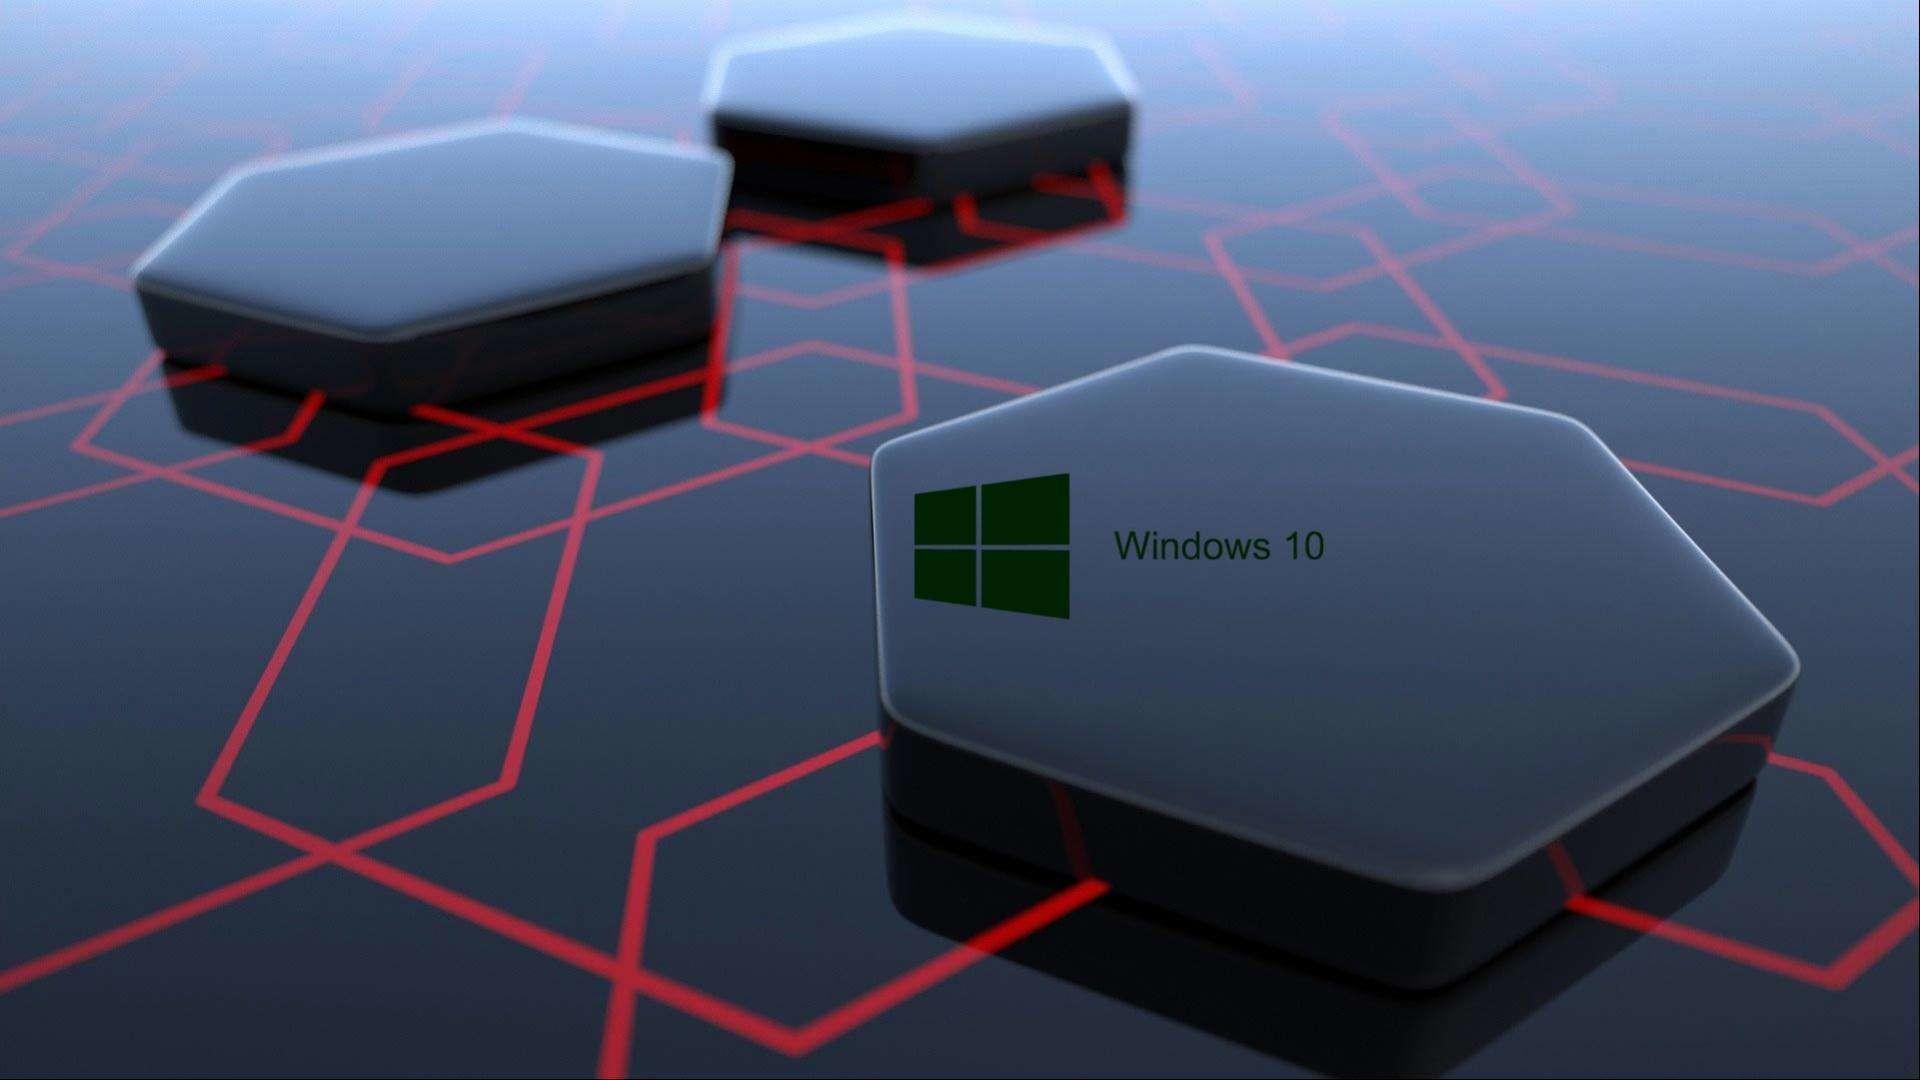 Windows 10 Wallpaper Hd 1080p